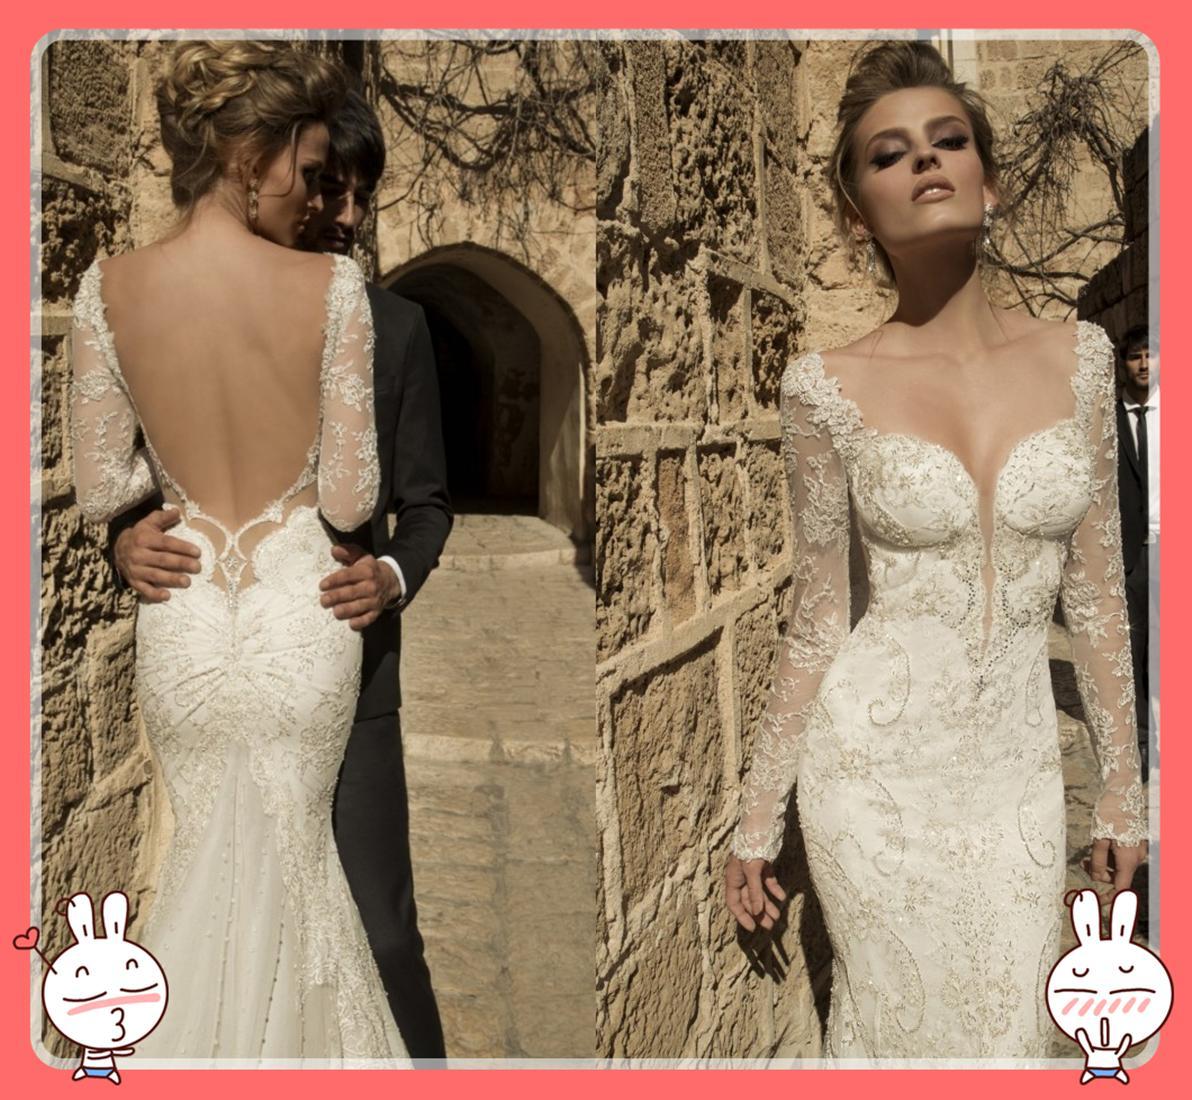 Emmani 2015 Winter Mermaid Wedding Dresses With Lace Applique Double Shoulder Sweetheart Corset